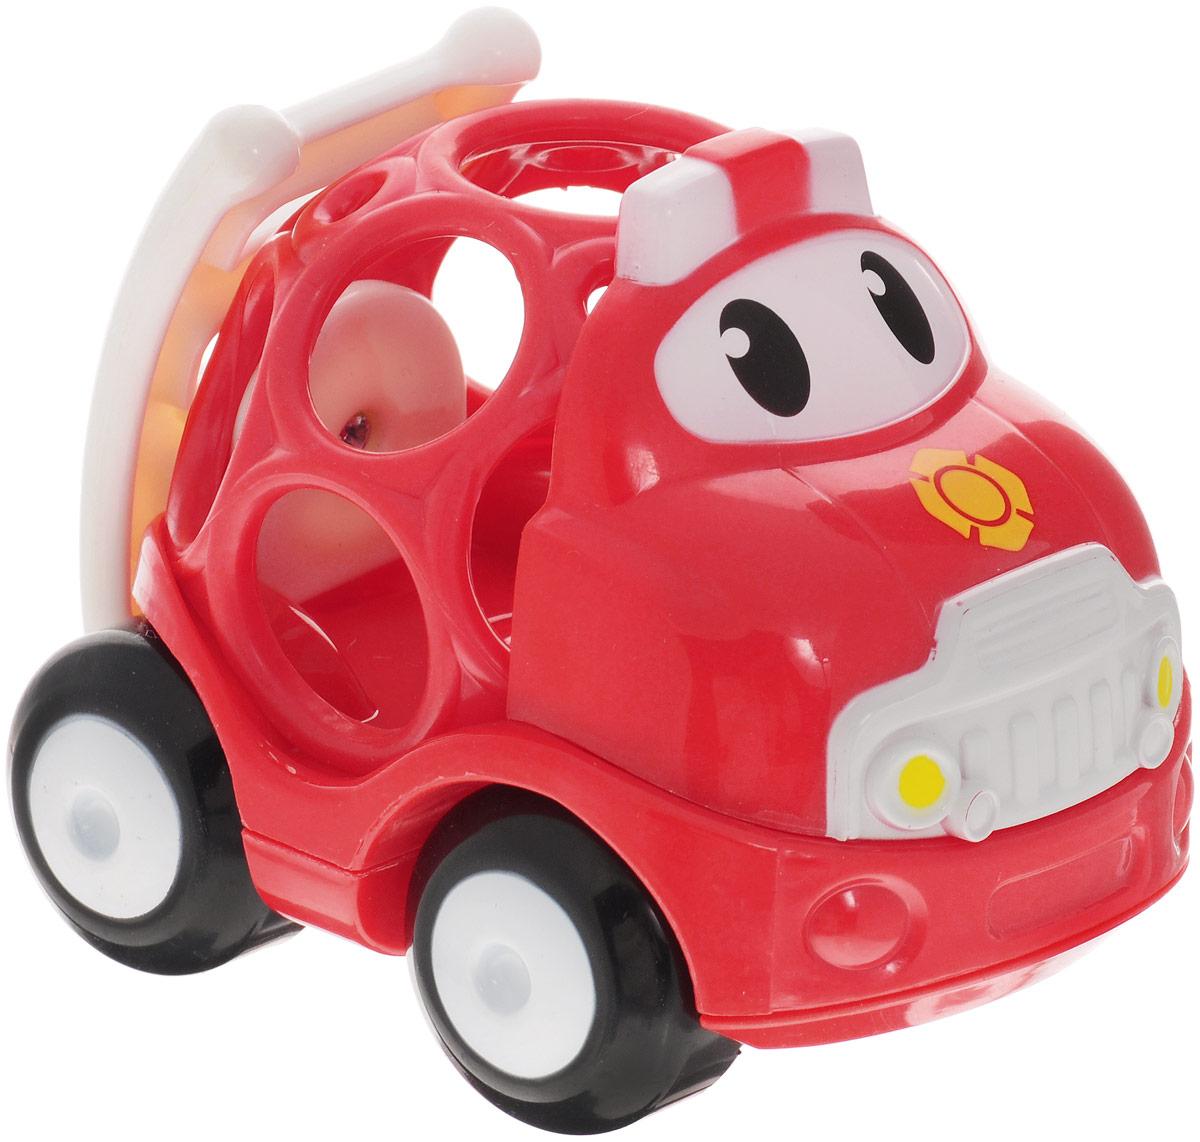 Oball Машинка Пожарная служба - Транспорт, машинки